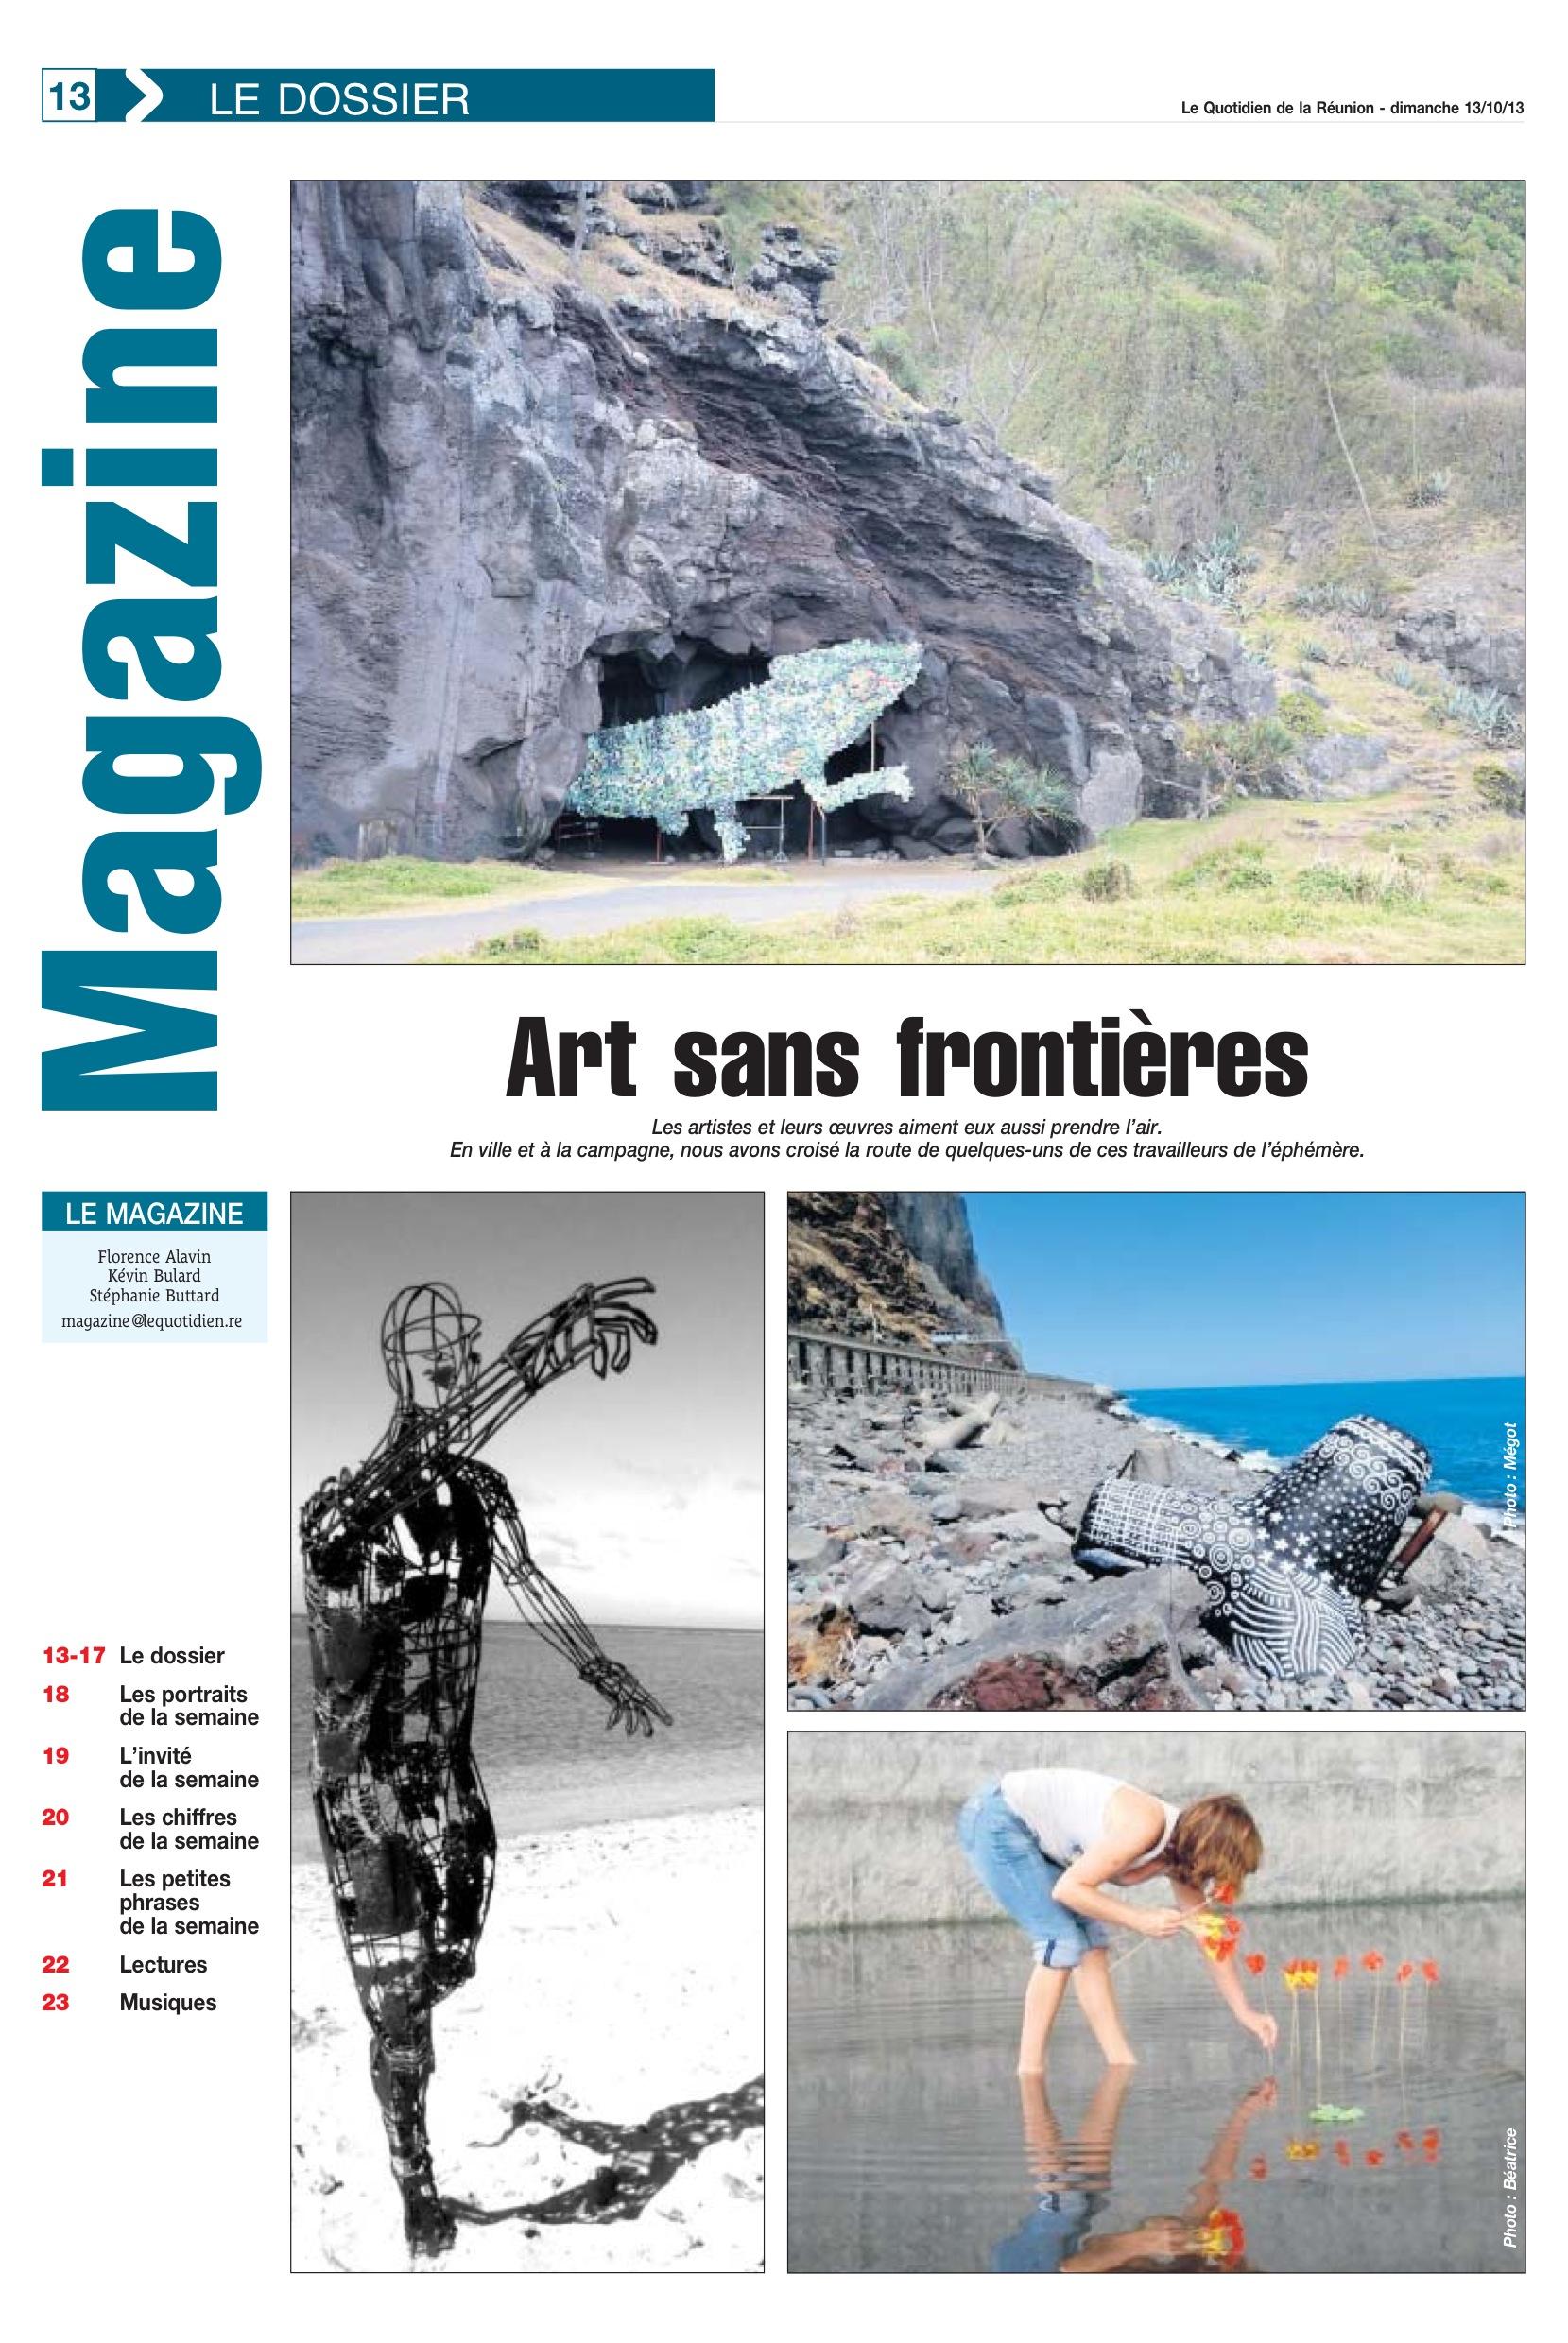 Presse-Quotidien-13102013-1